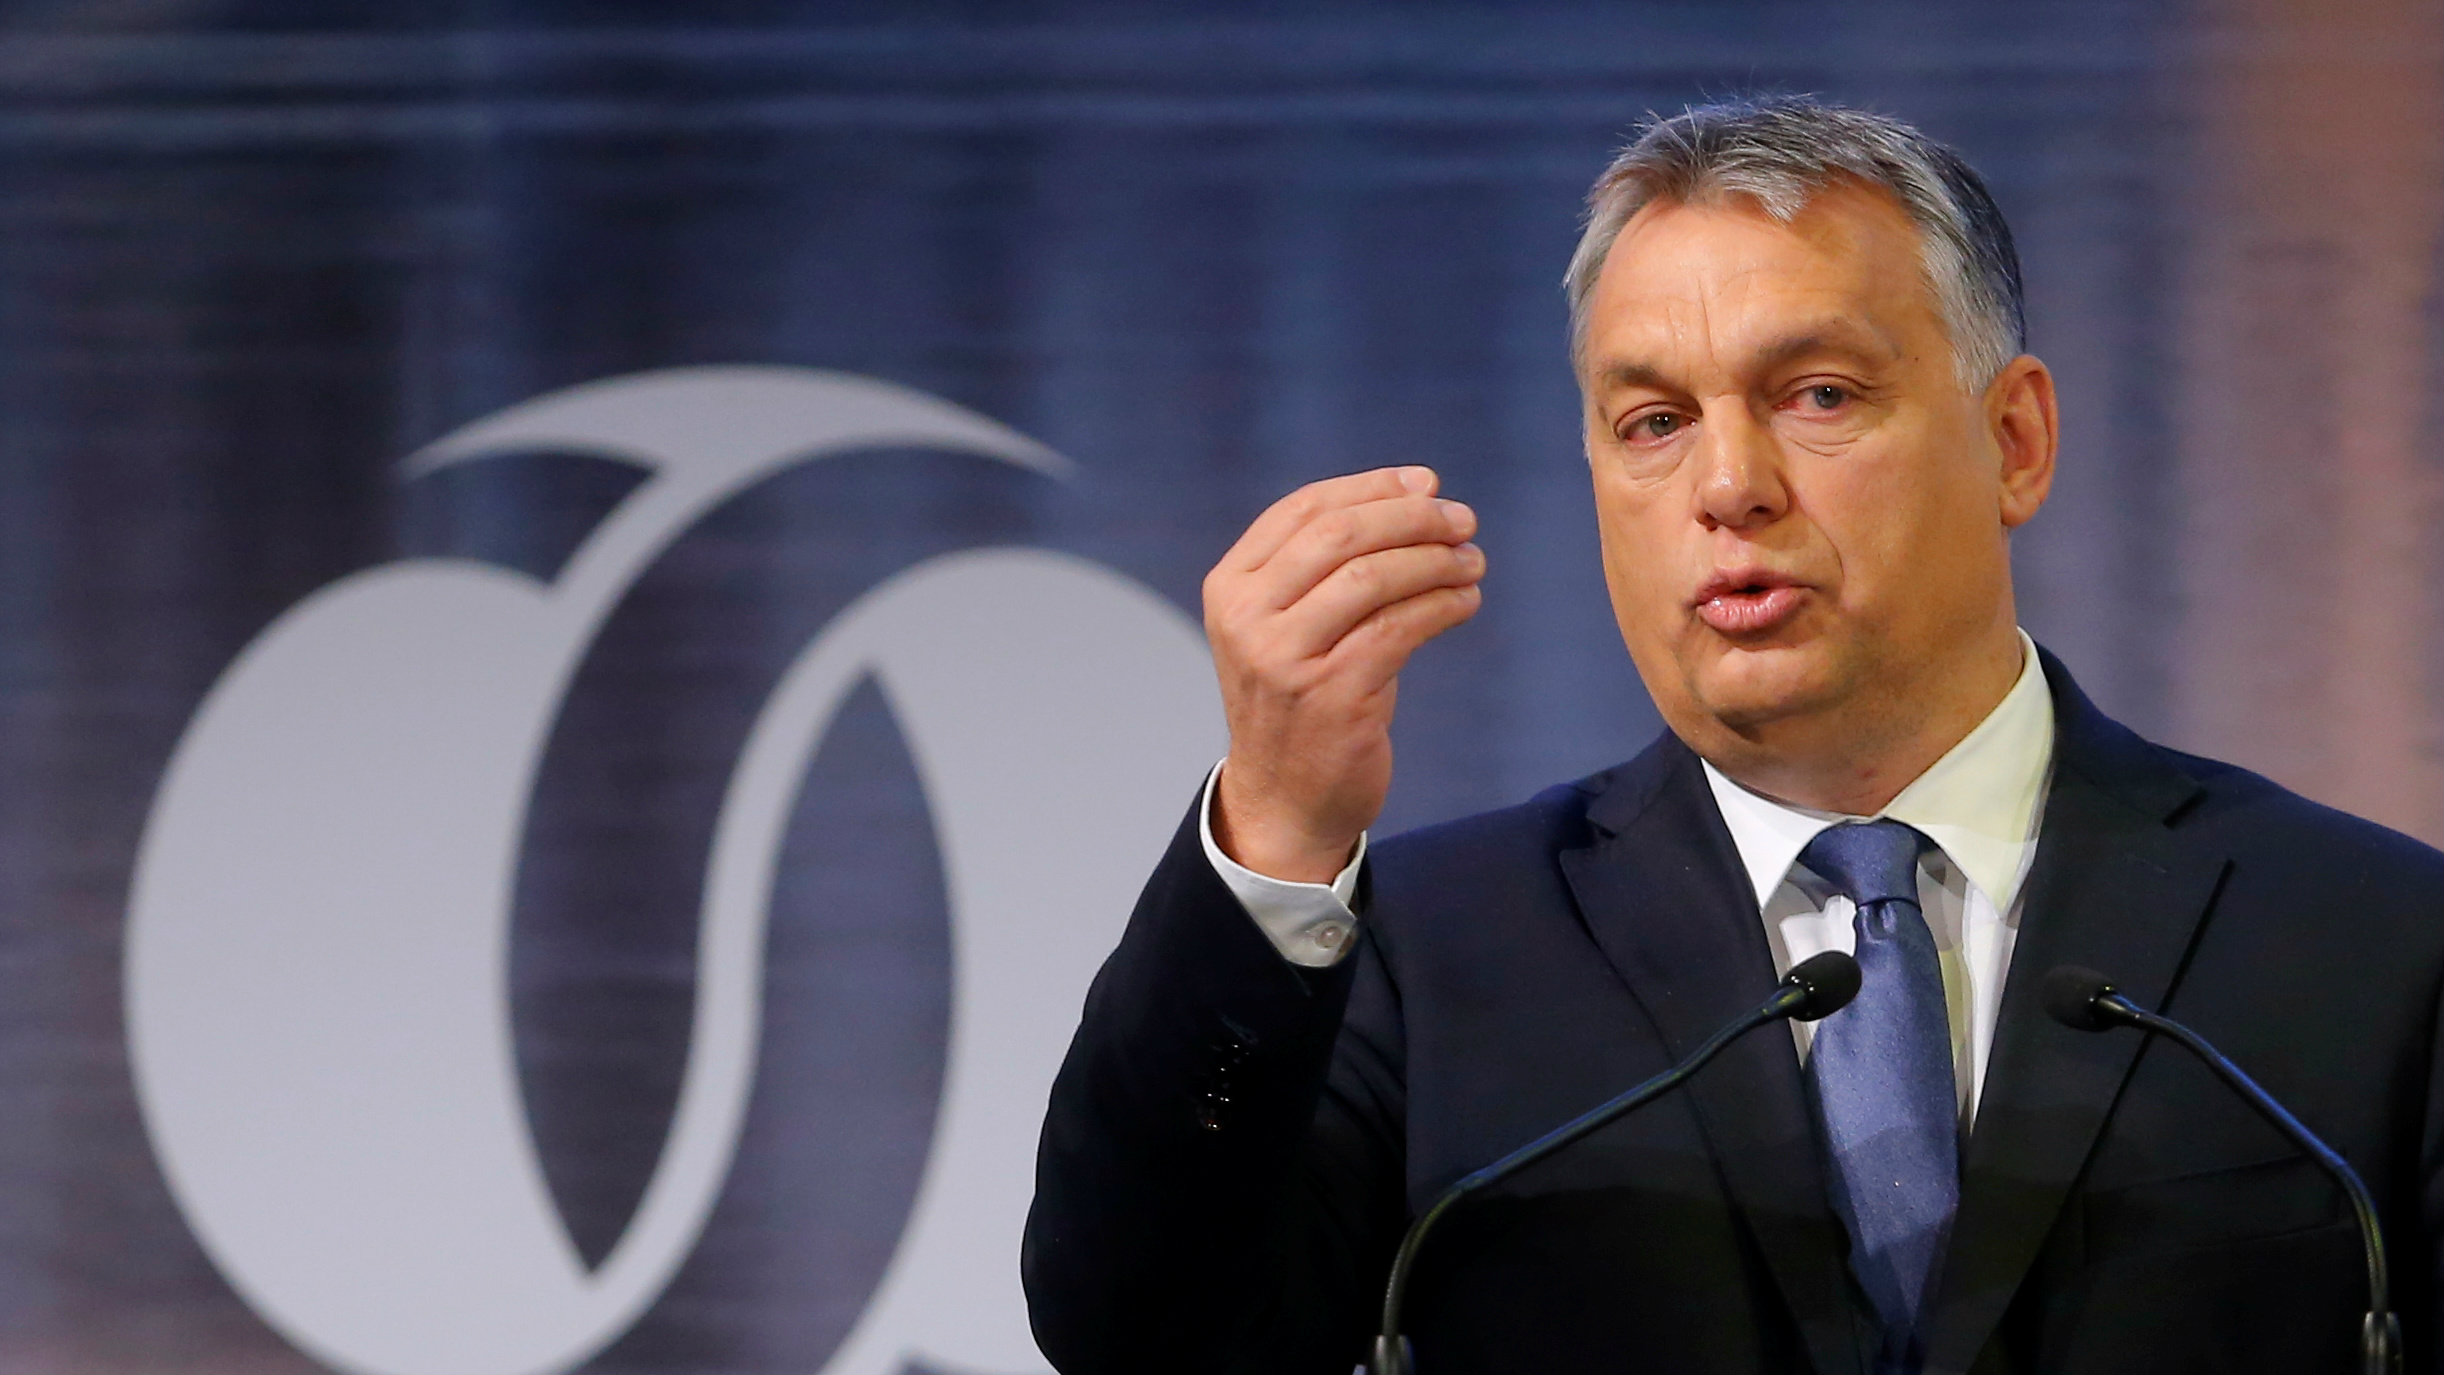 Hungarian Prime Minister Viktor Orban delivers a speech.